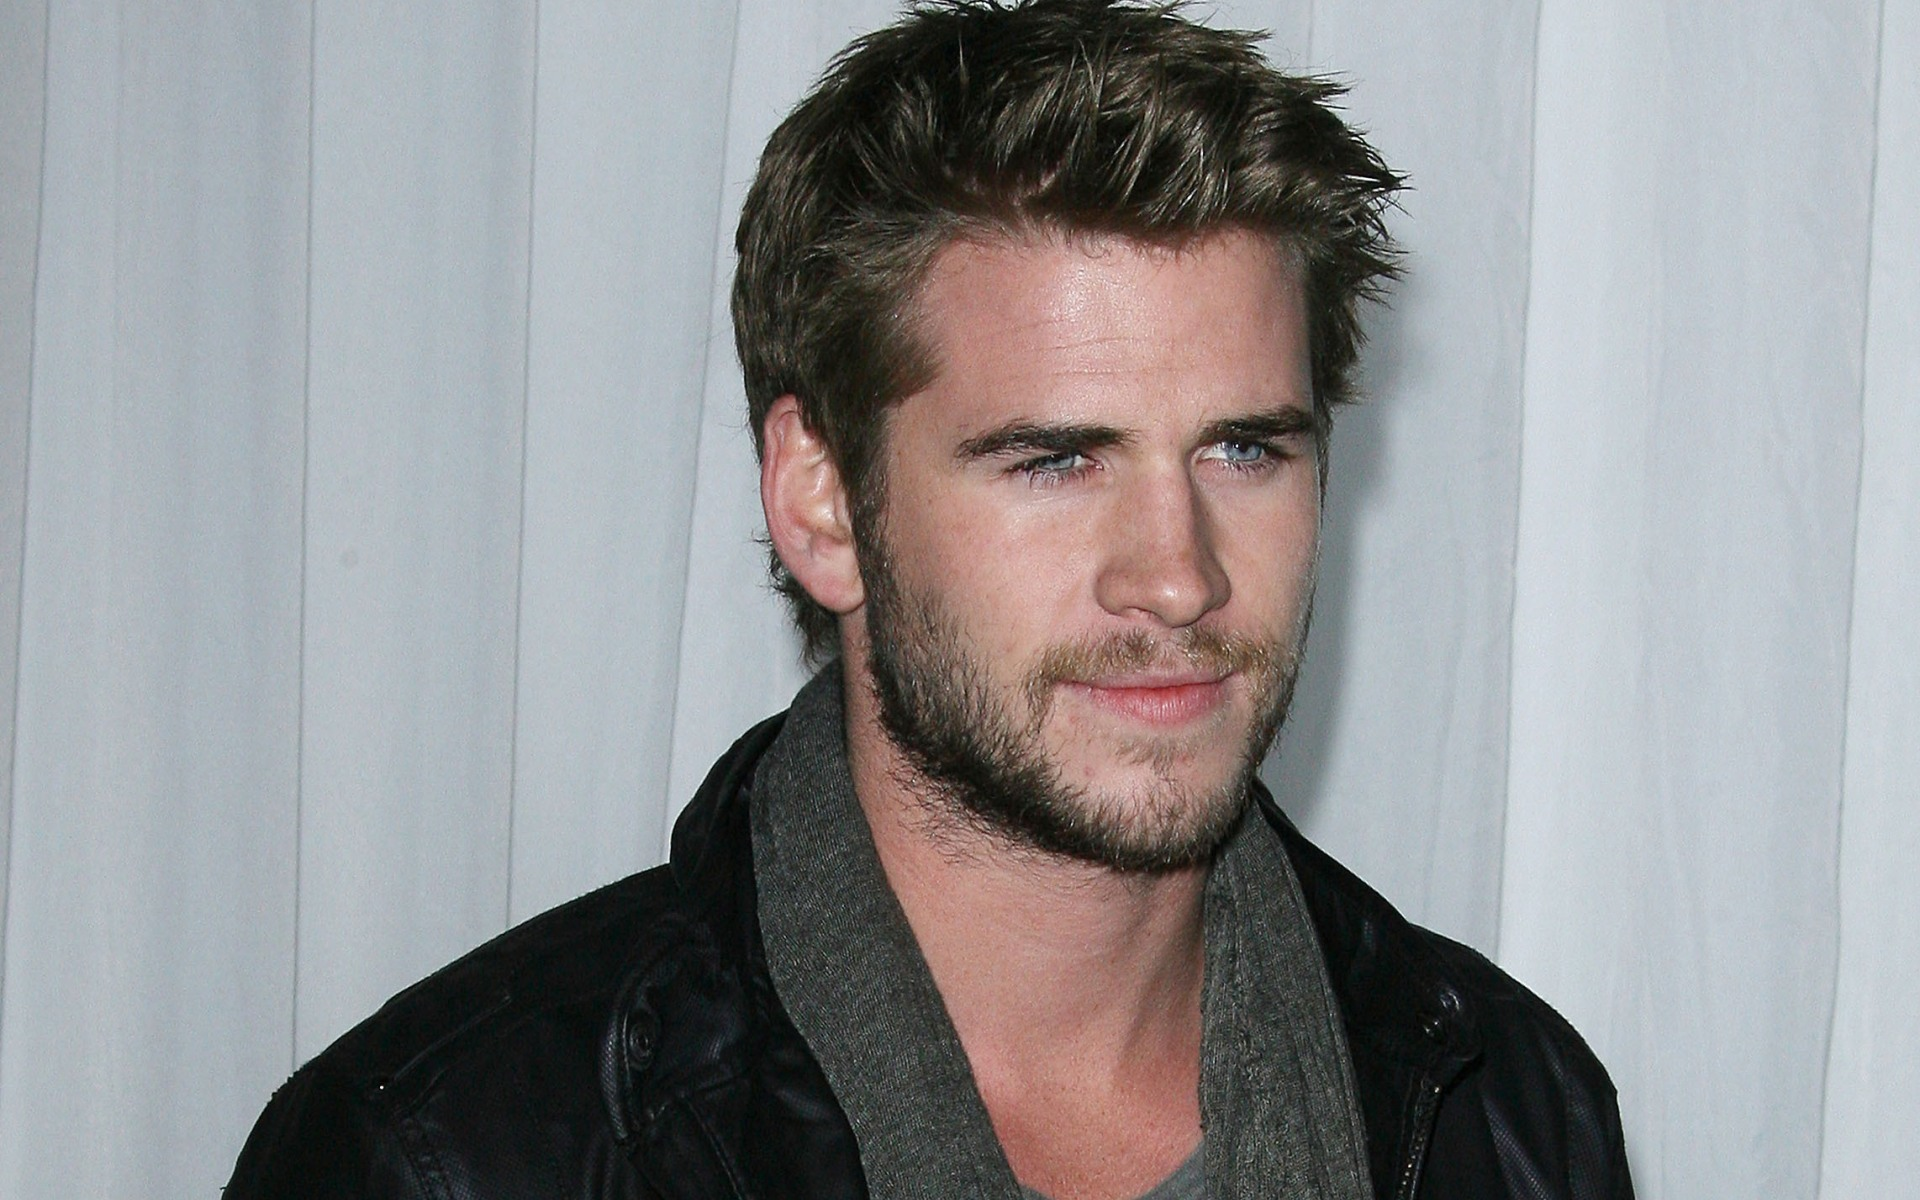 Liam Hemsworth Wallpaper · Liam Hemsworth Wallpaper ...